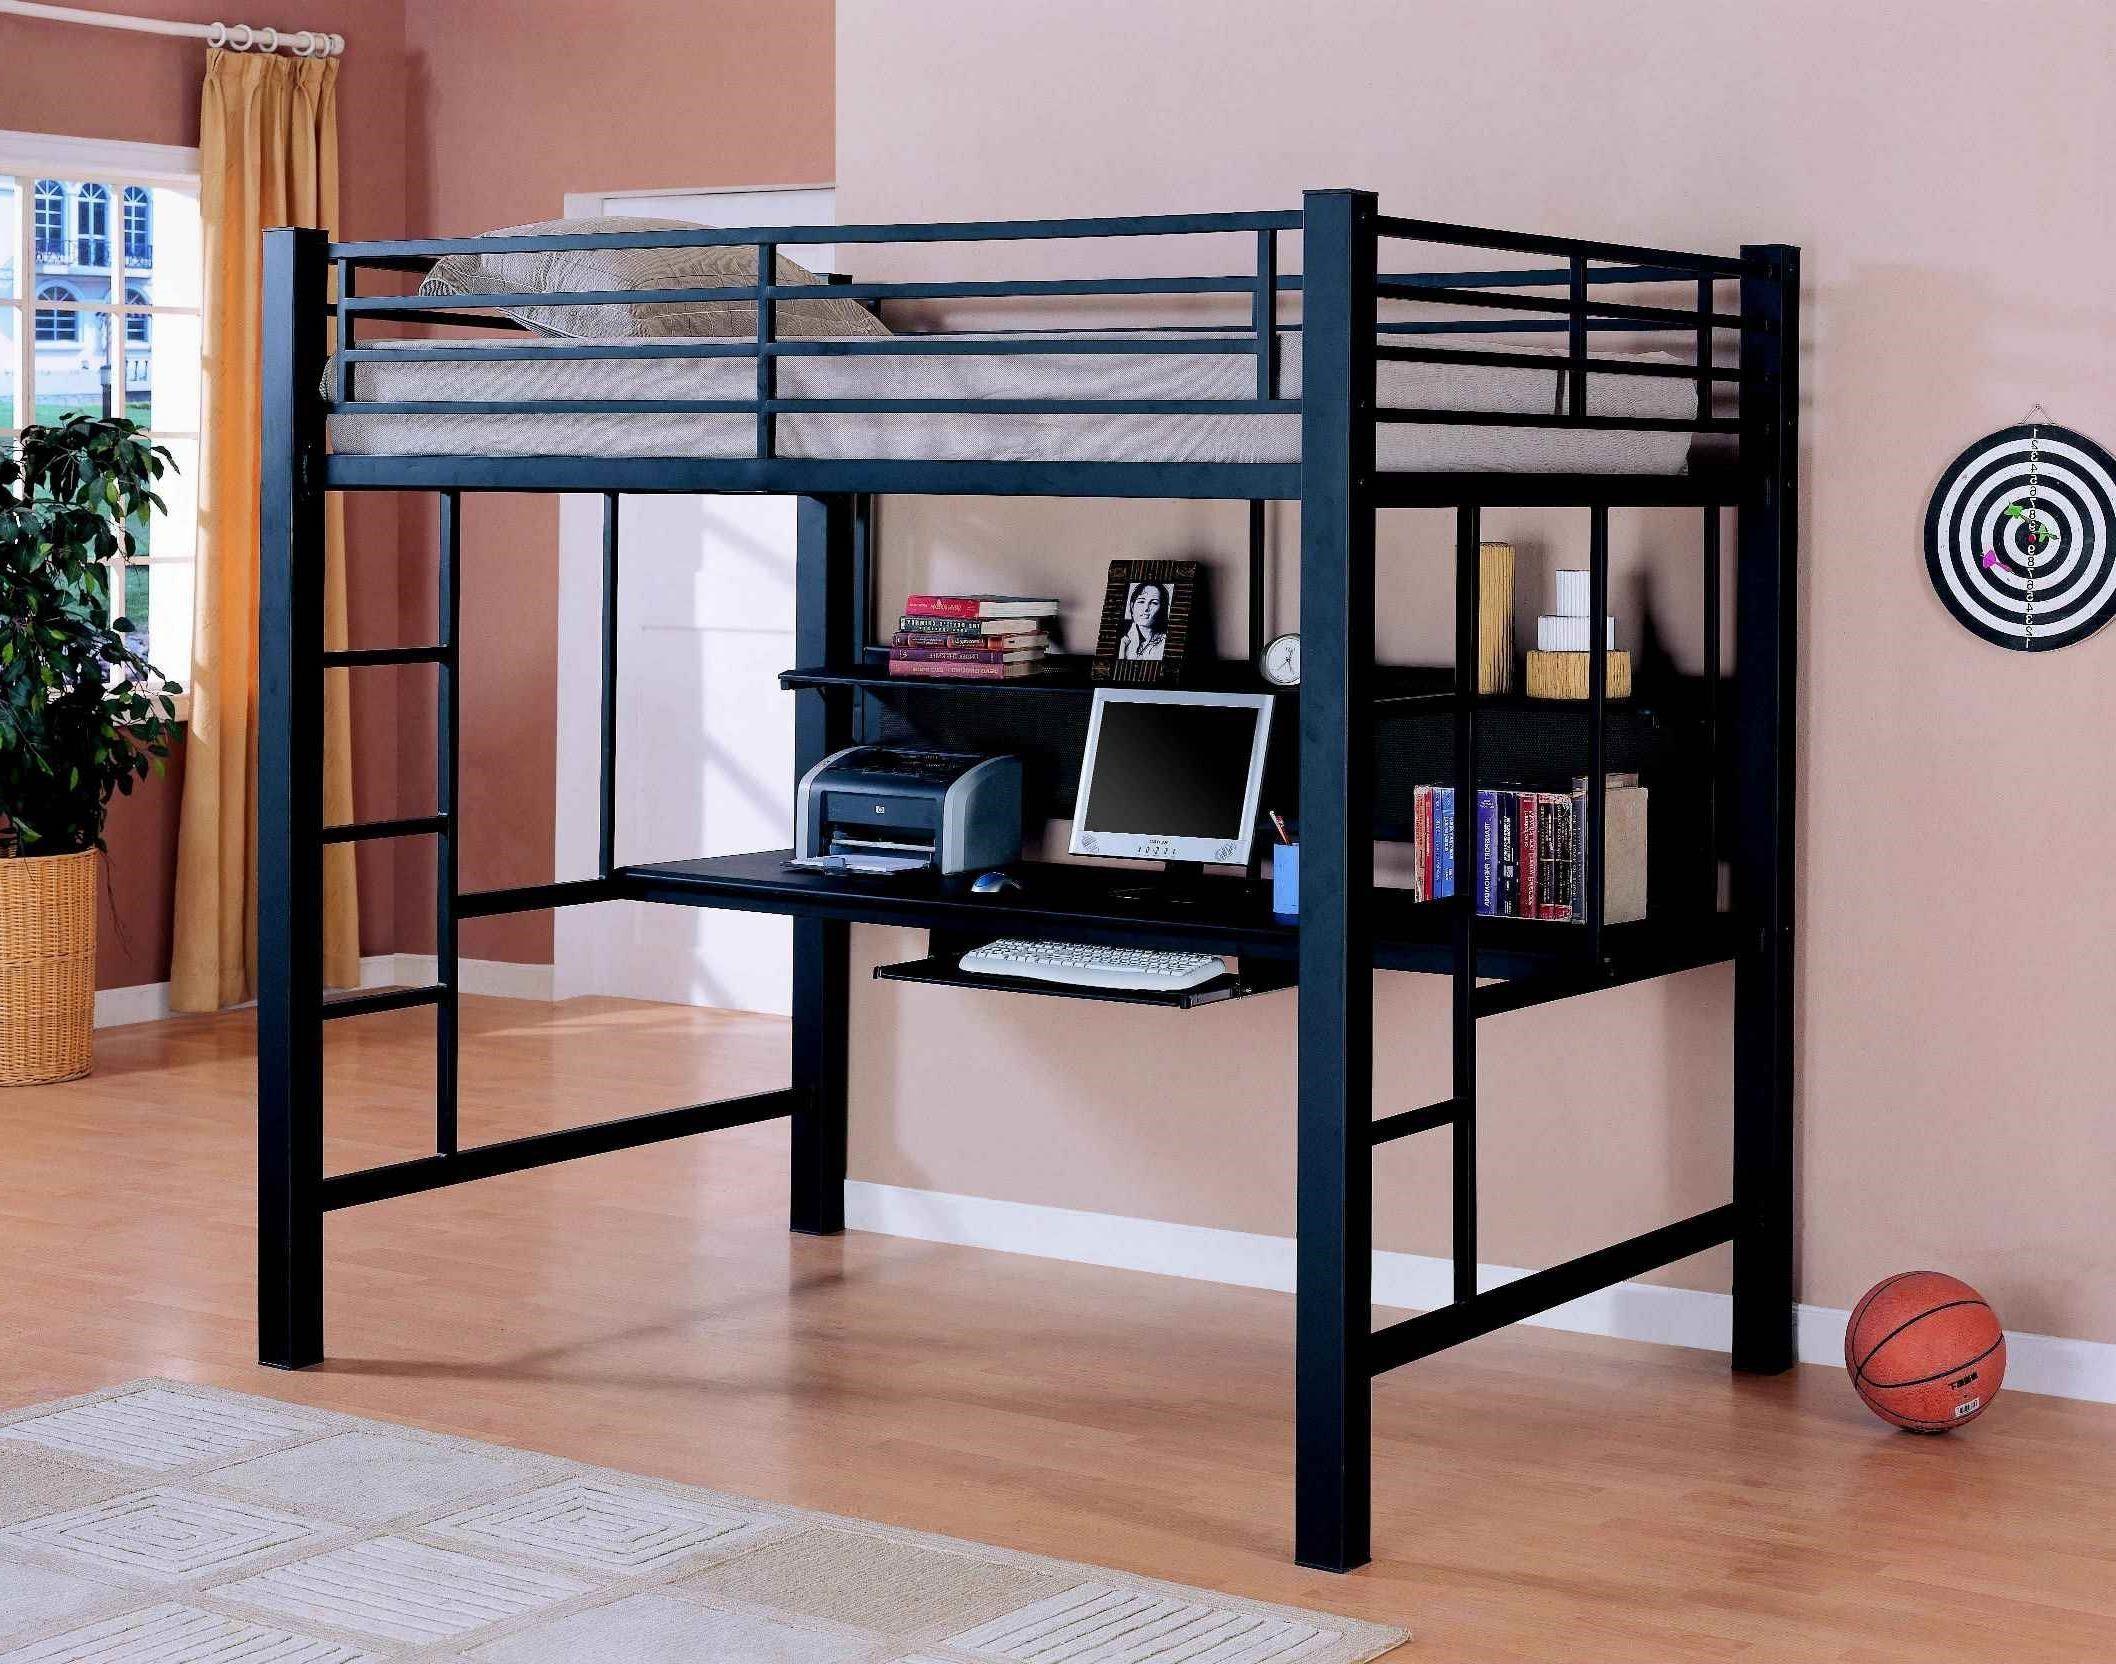 Loft Bunk Bed With puter Desk